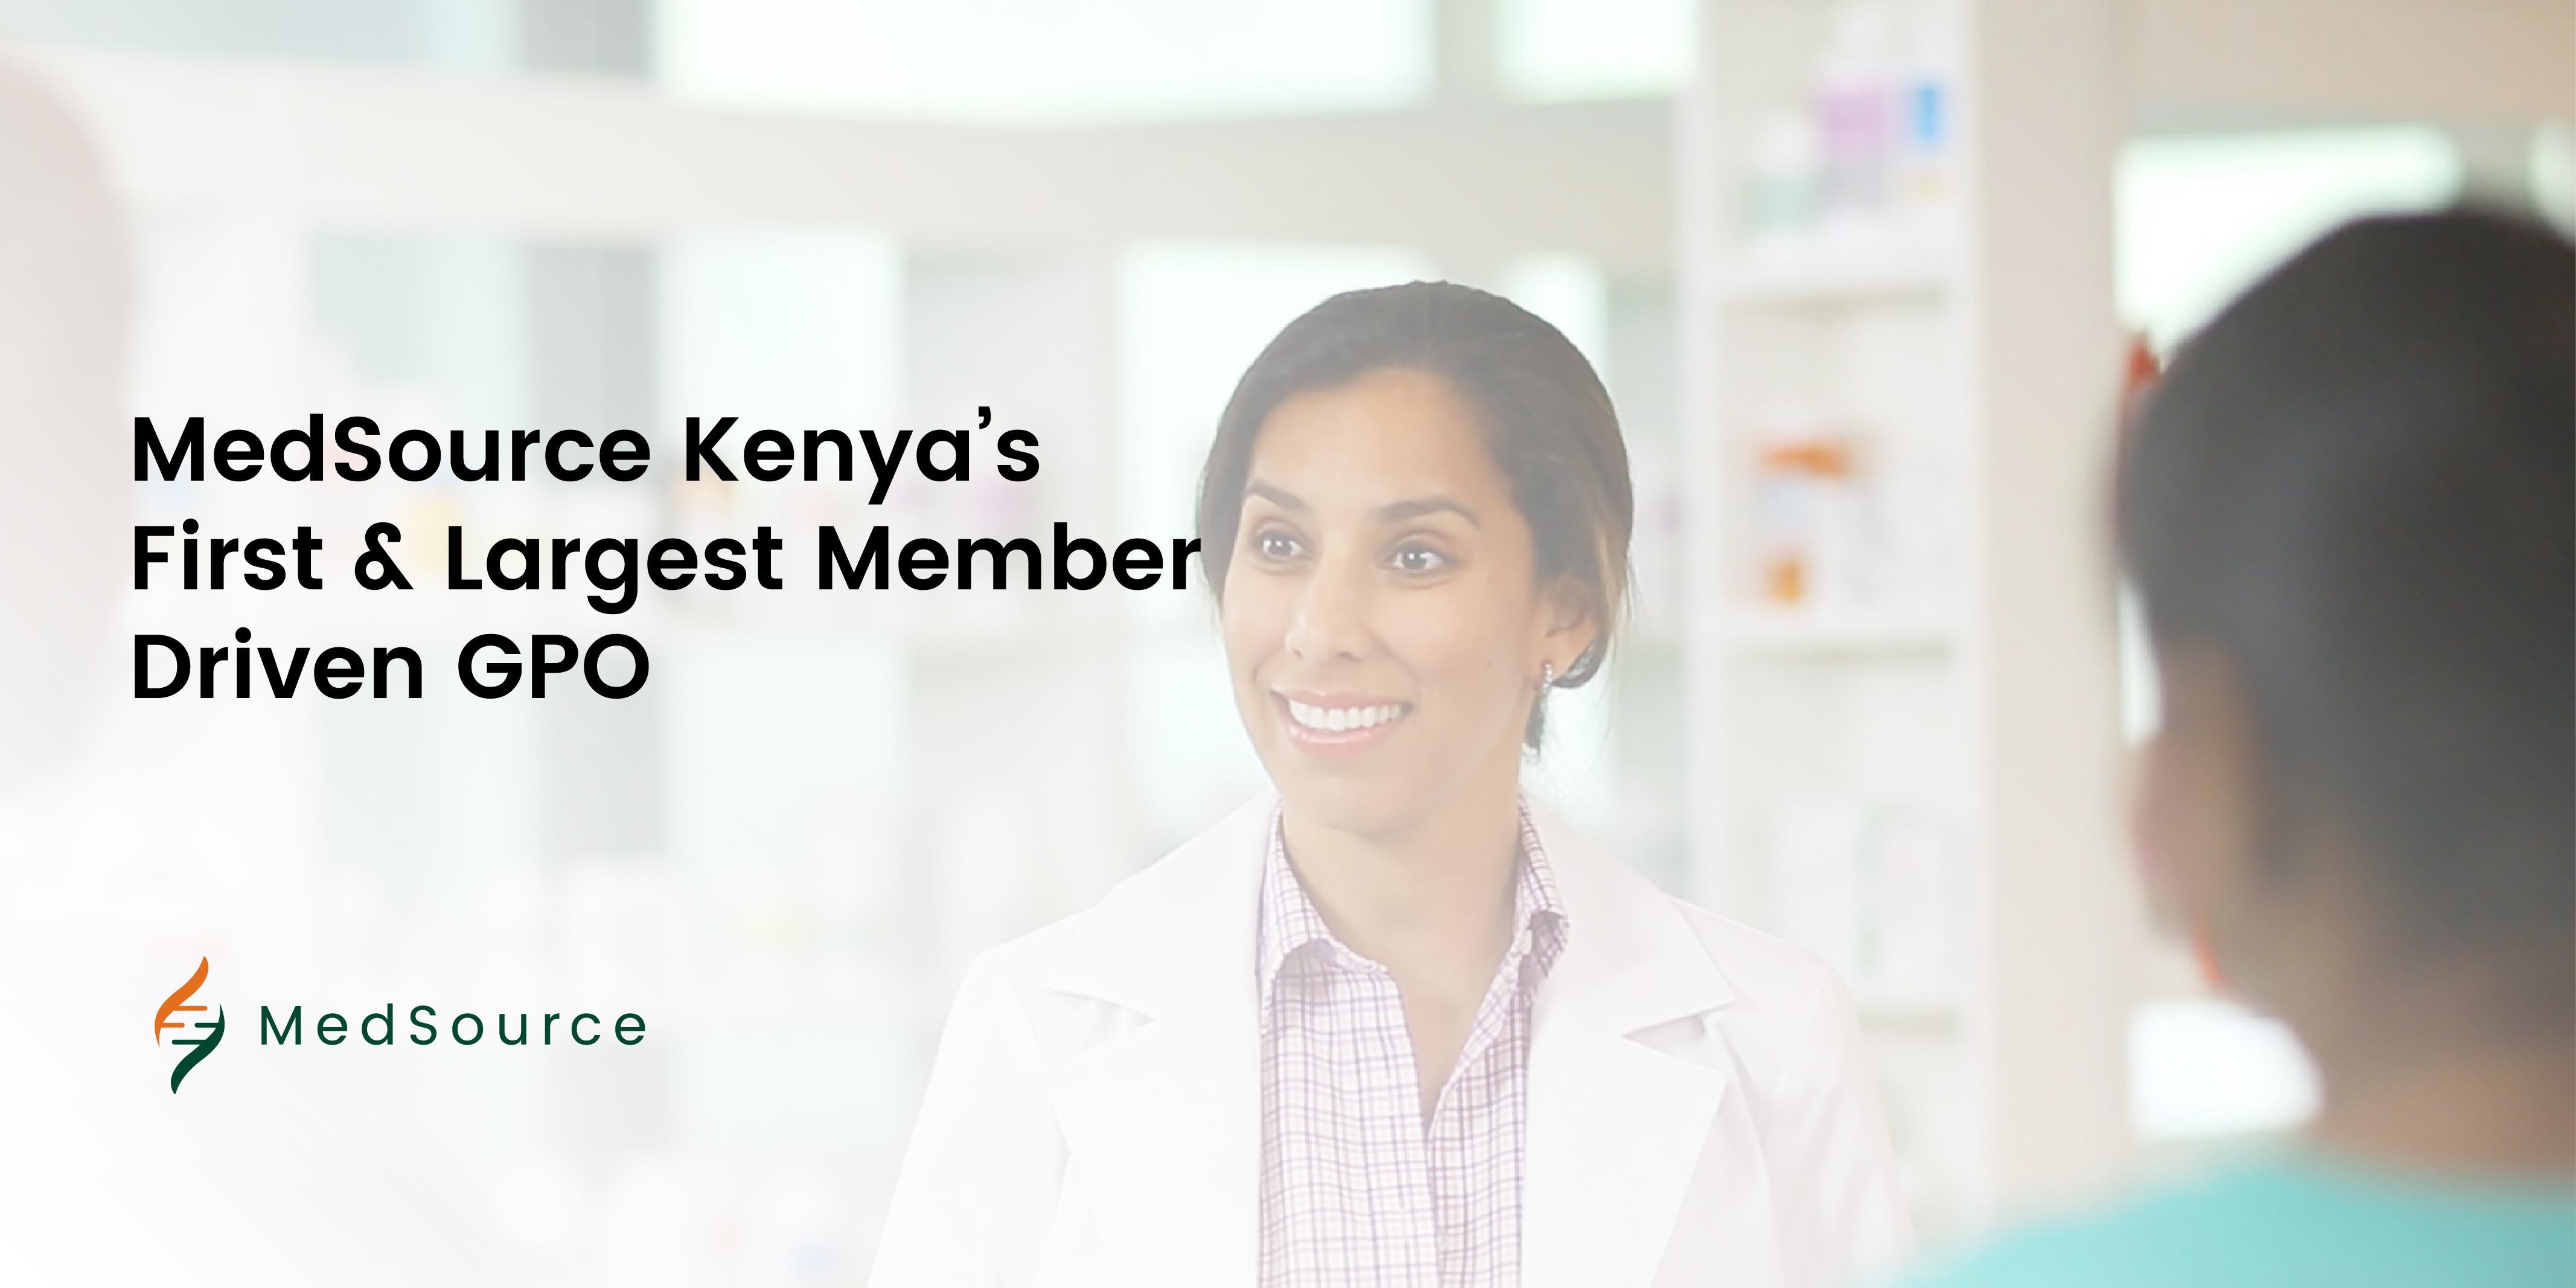 MedSource Kenya's First & Largest Member Driven GPO